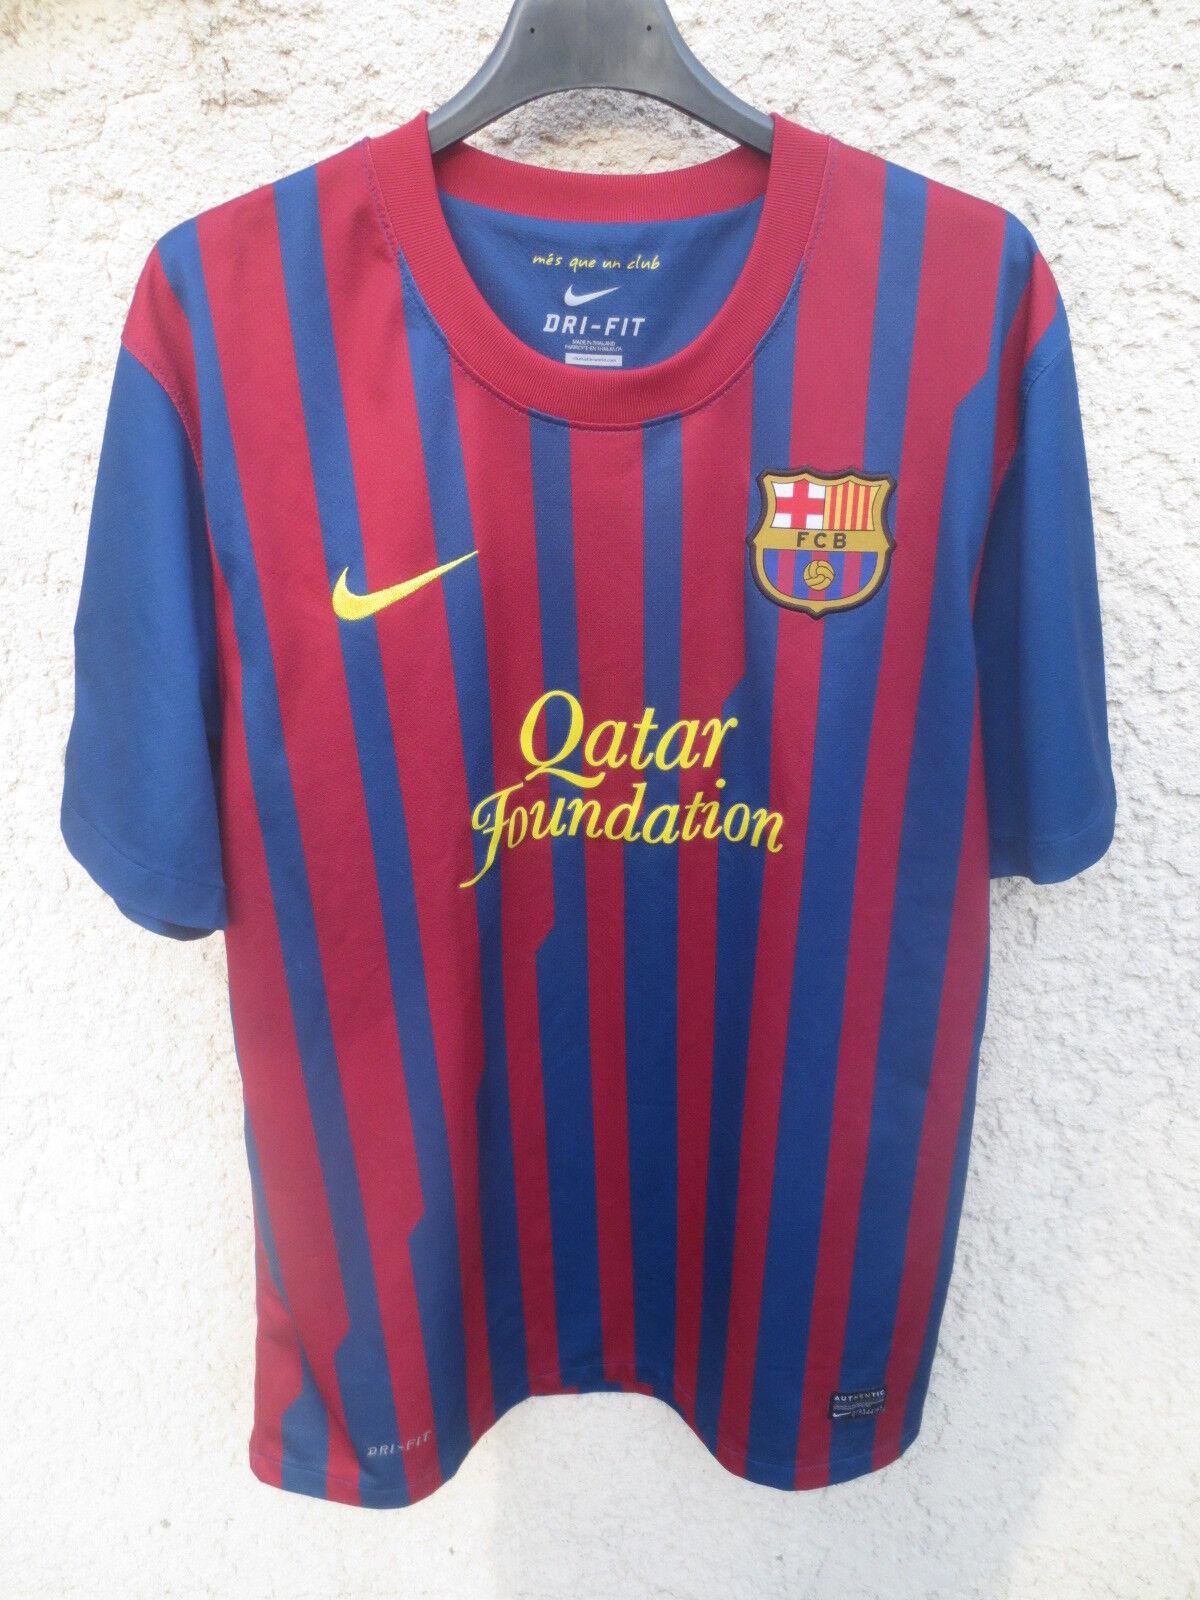 Maillot BARCELONE BARCELONA 2012 camiseta home shirt NIKE Qatar Foundation LFP L